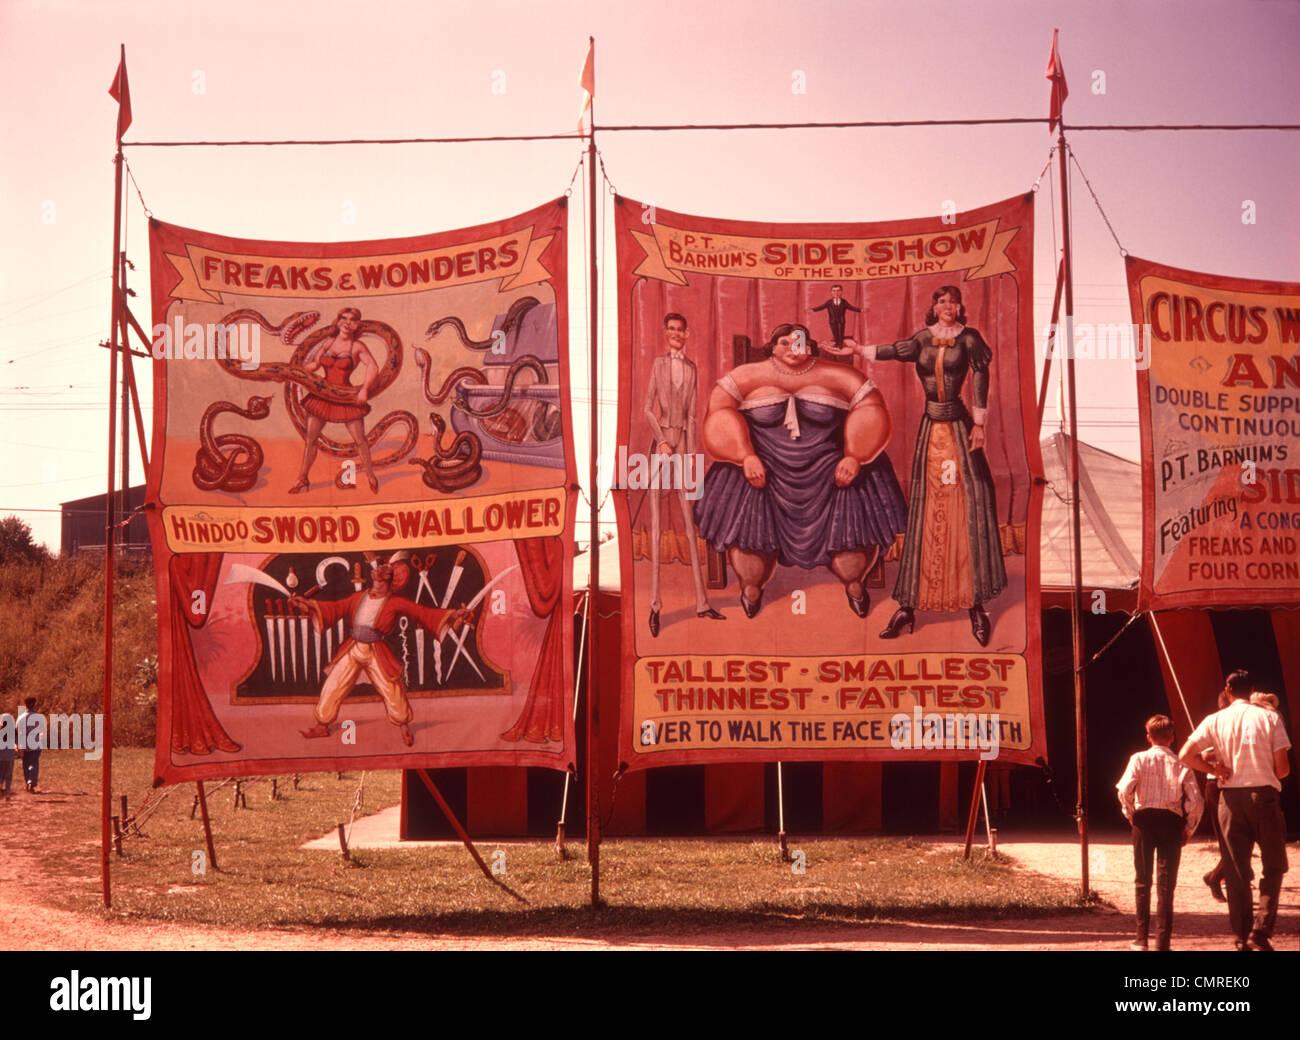 1970 toiles peintes AFFICHES BANNIÈRES SIDESHOW CIRQUE CARNAVAL Photo Stock